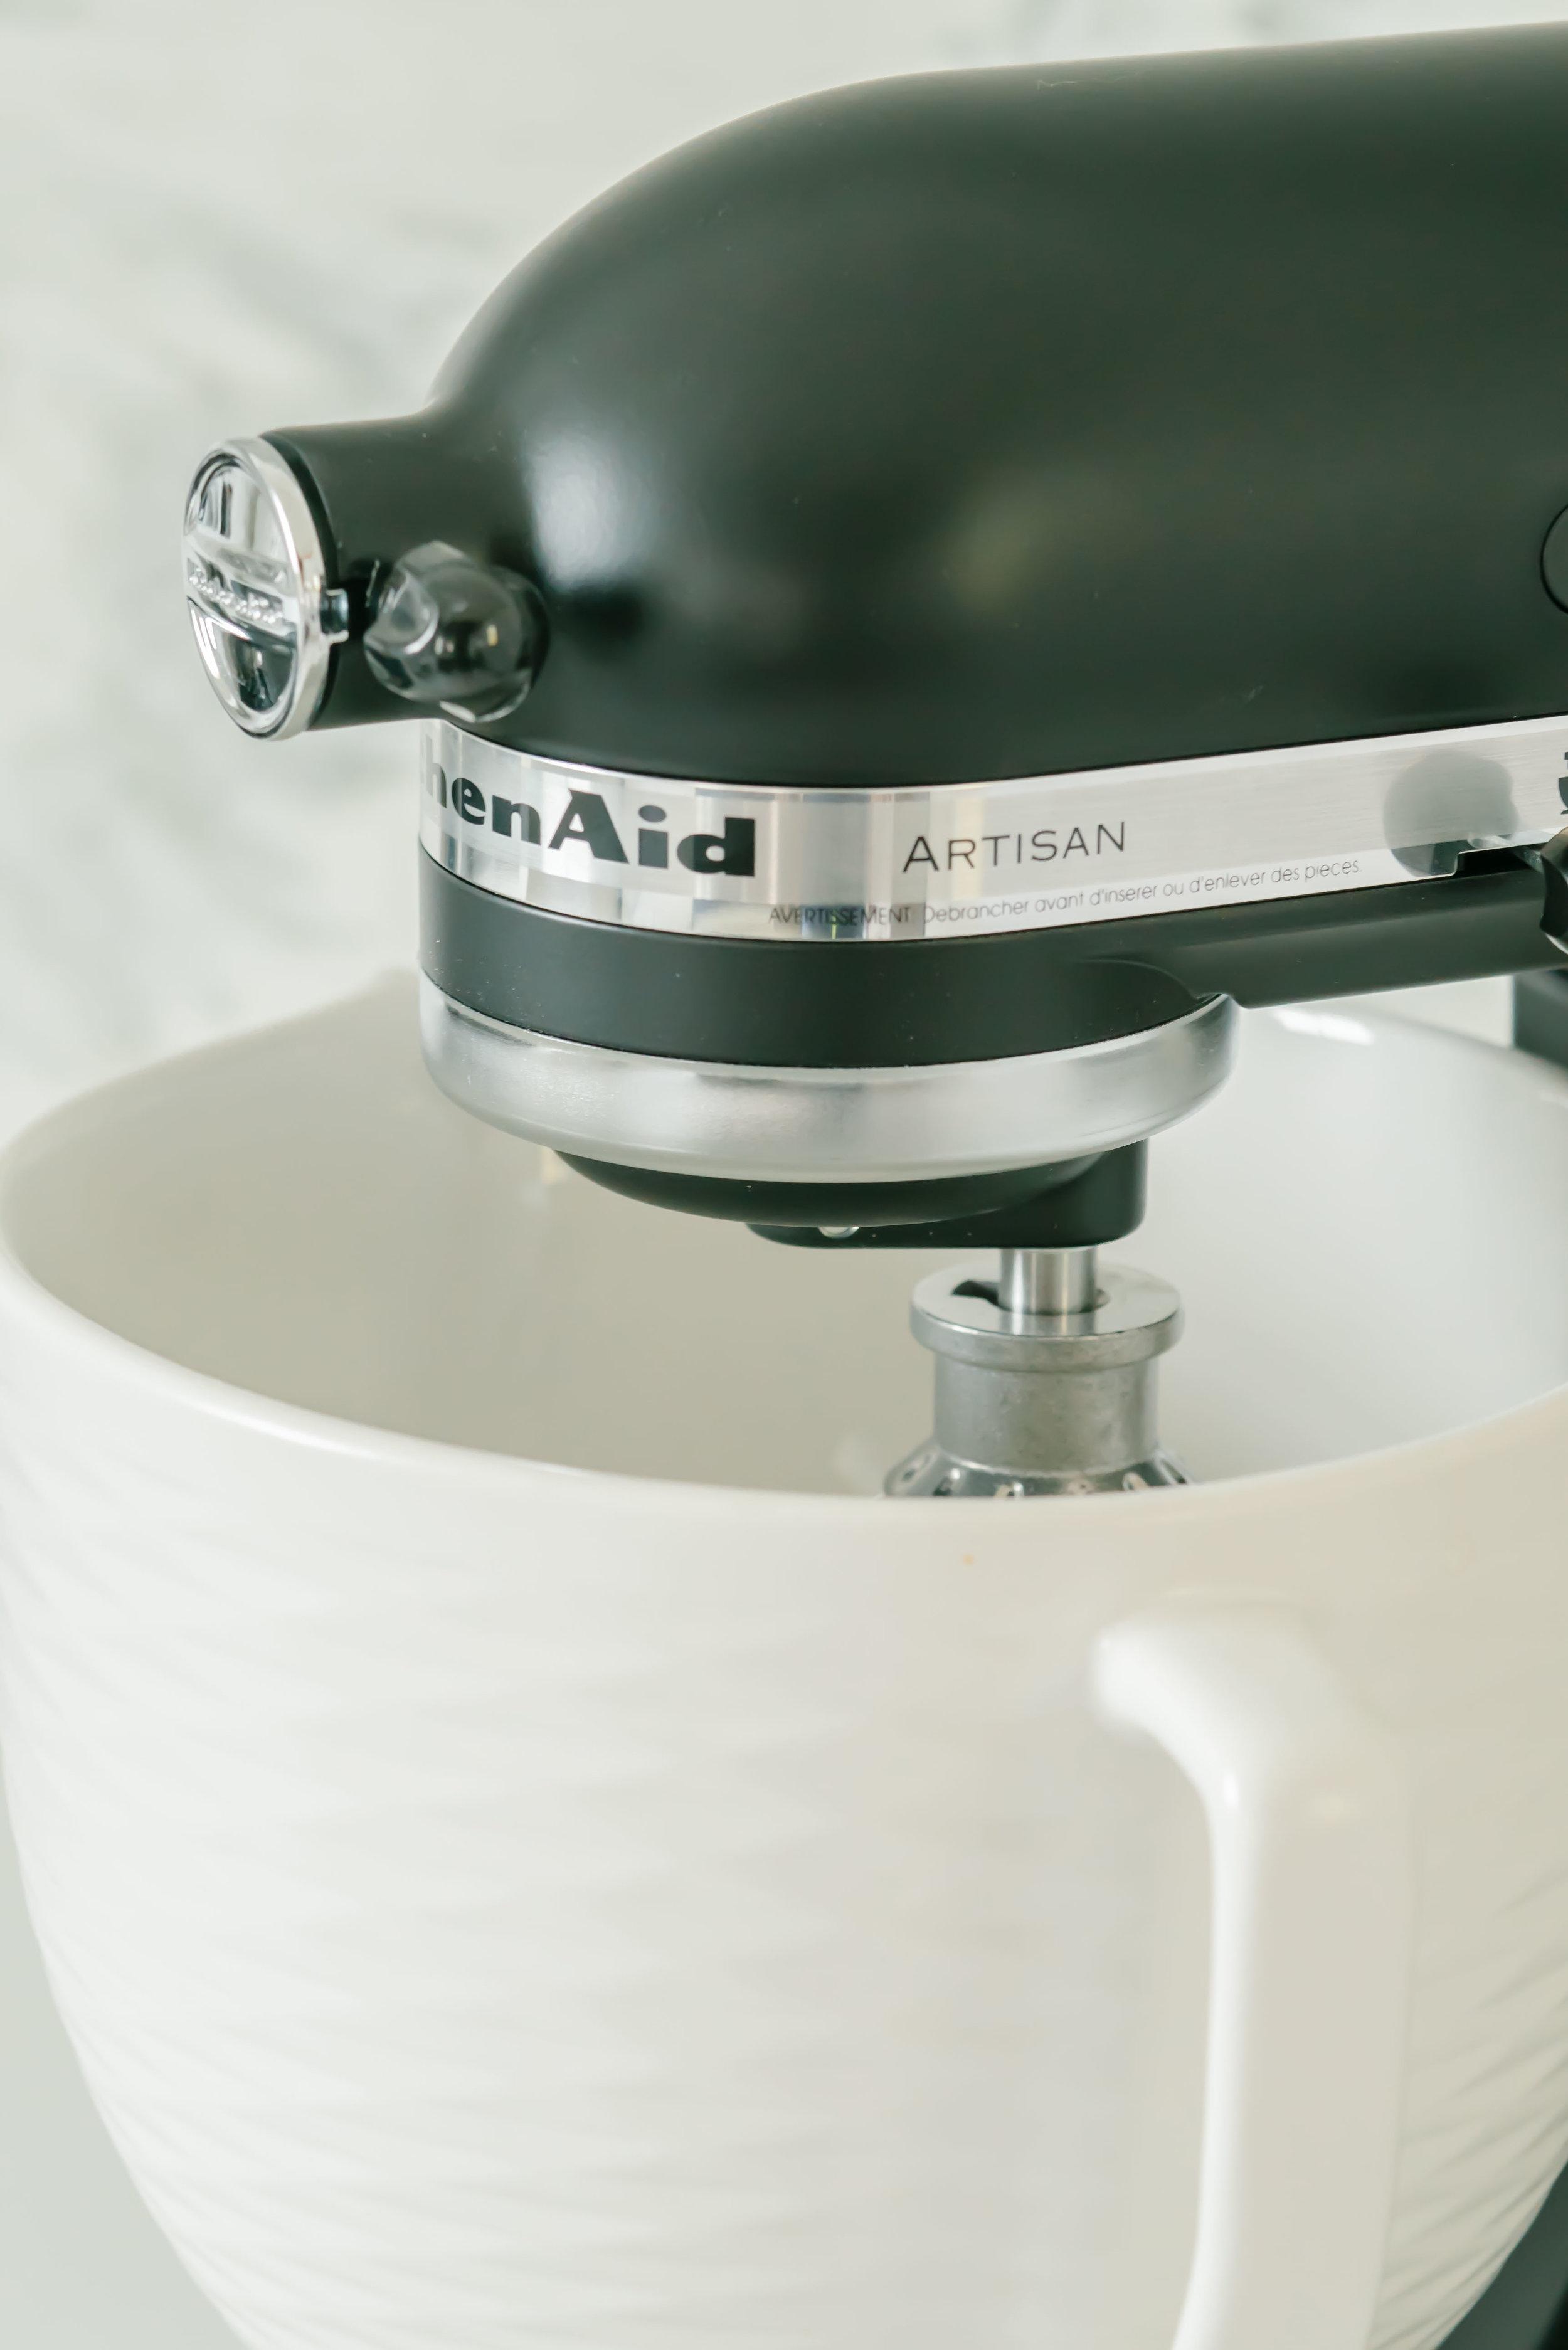 Matte Black KitchenAid Mixers and Ceramic Mixer Bowls